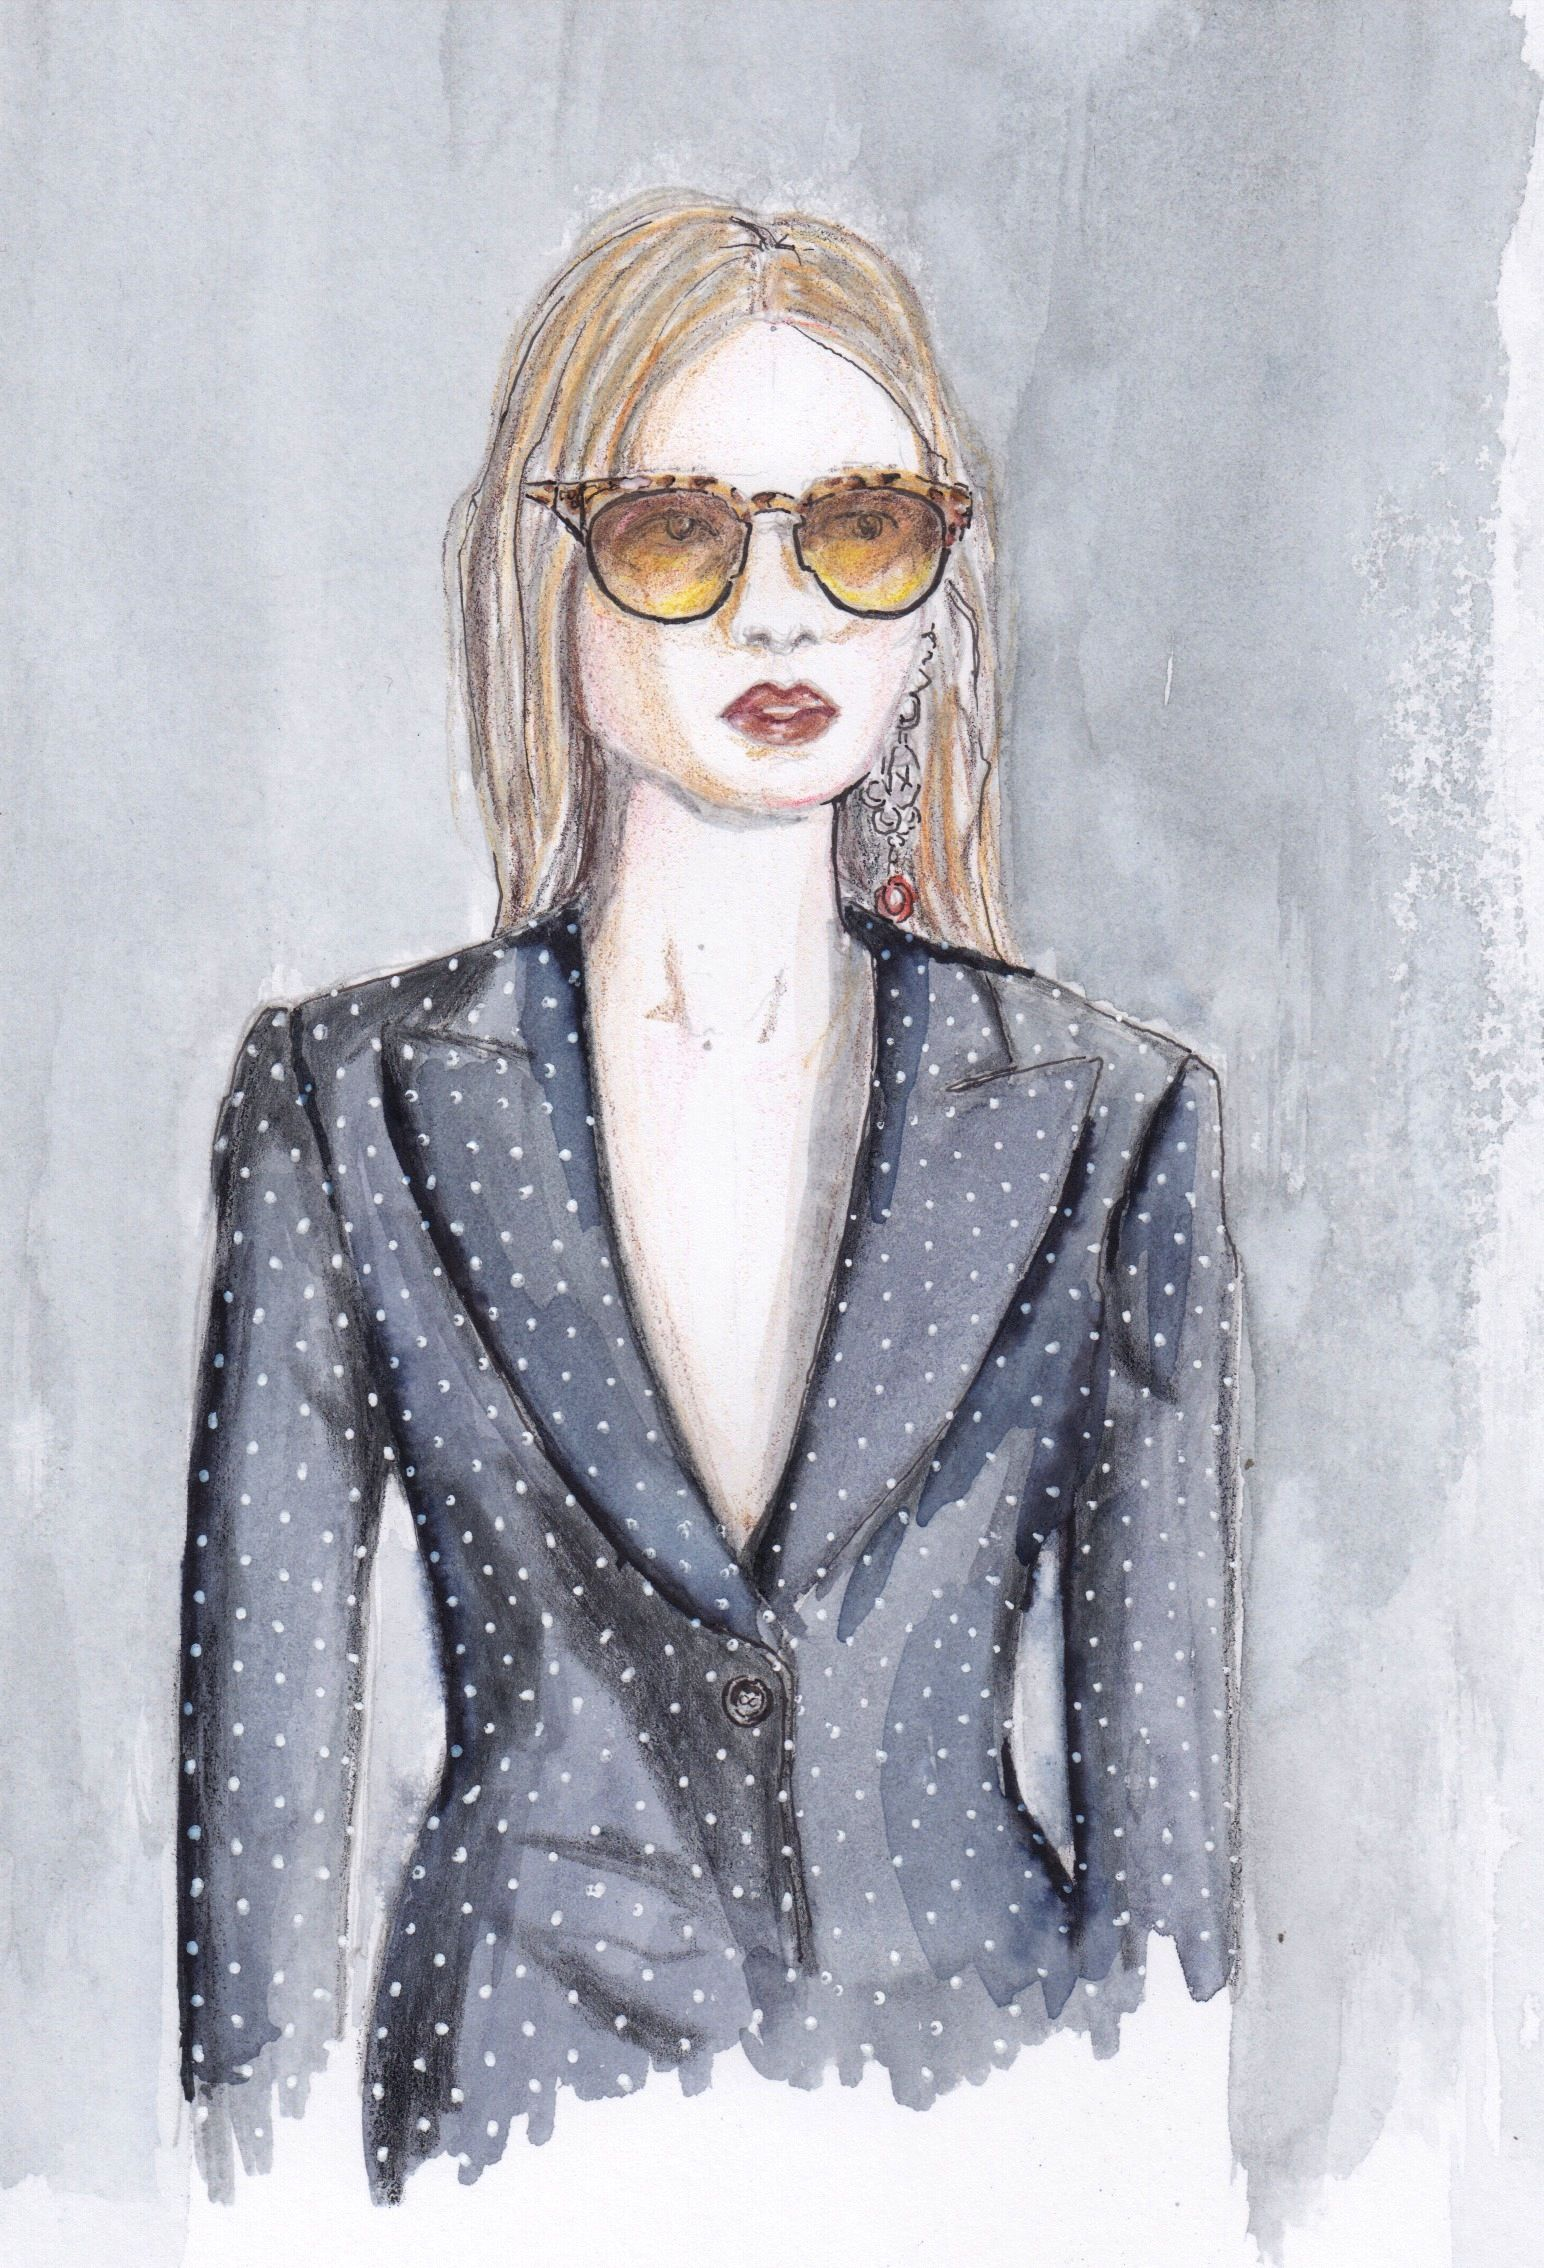 Christian Dior PreFall 2016 Pre fall 2016, Pre fall